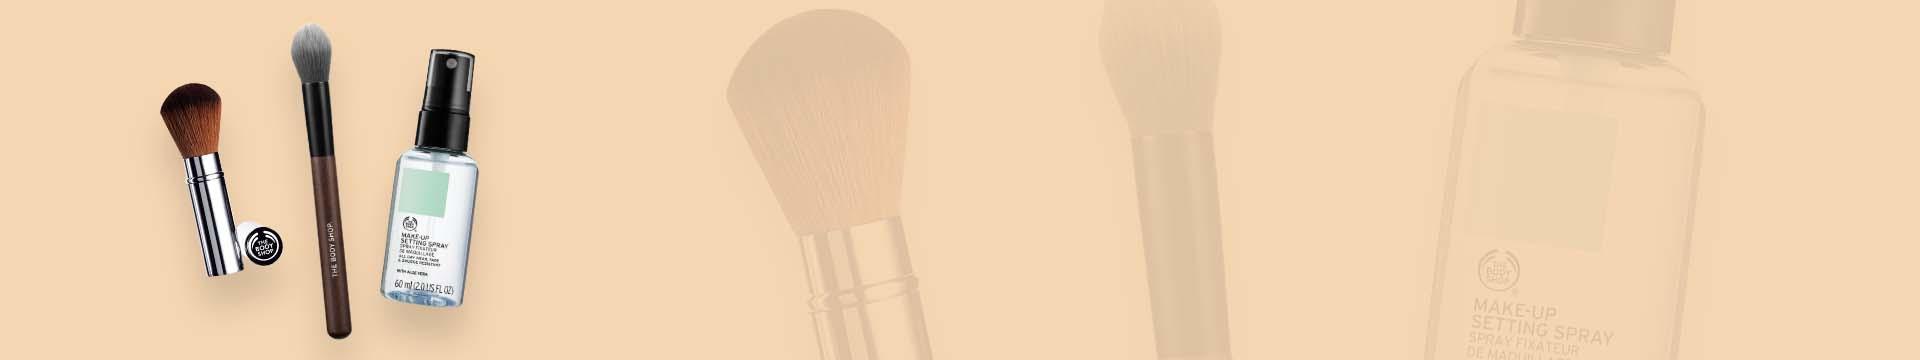 Brush & Tools